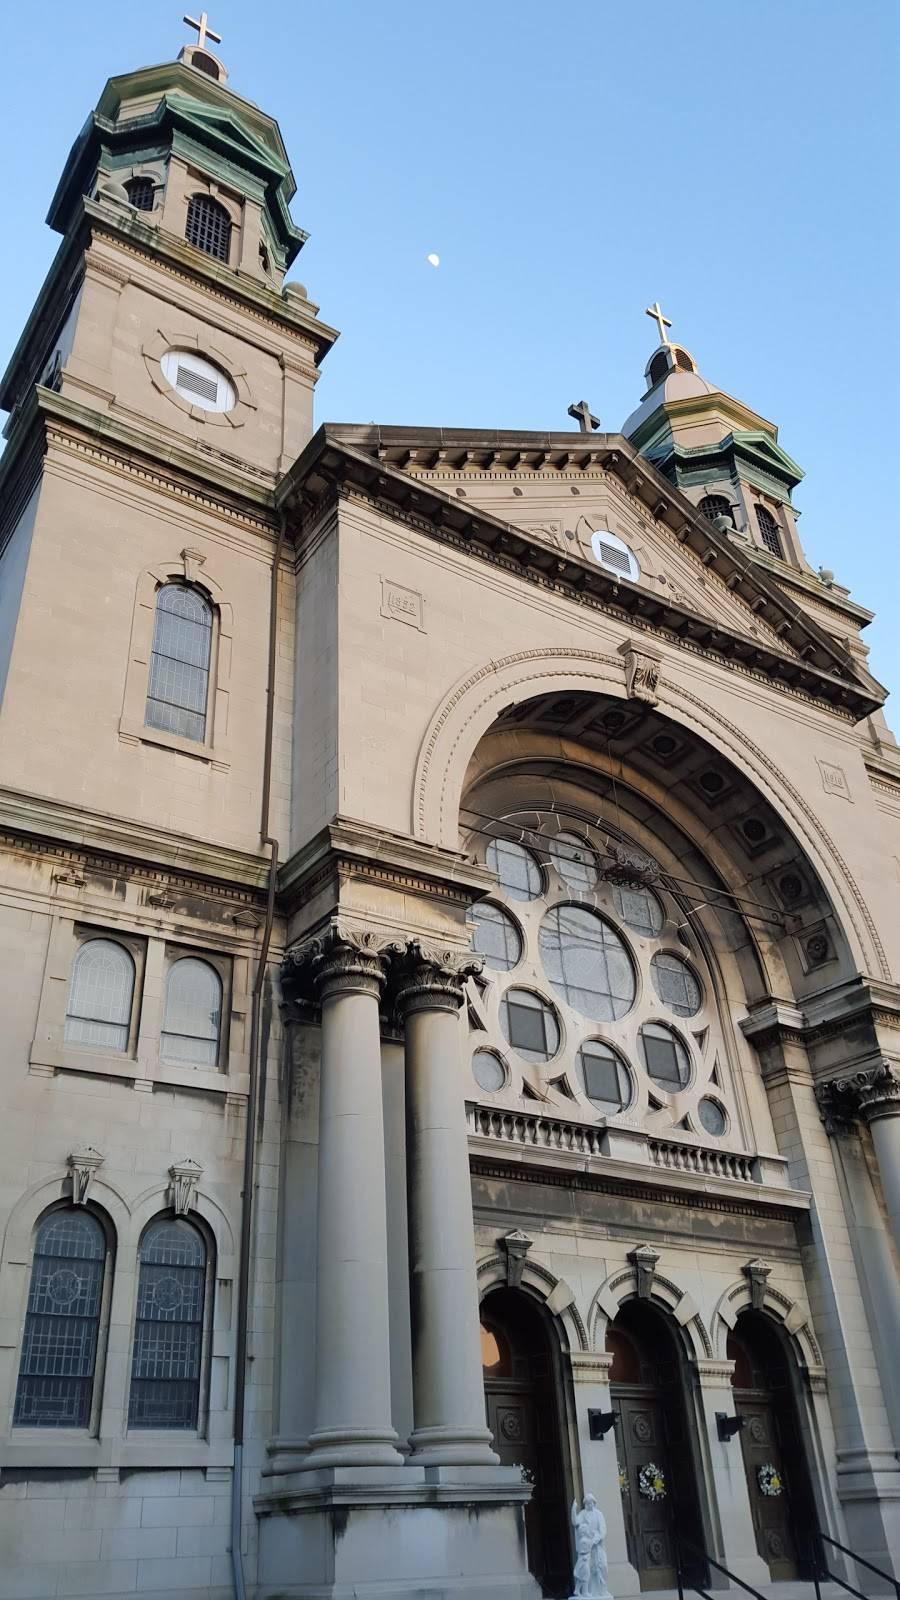 St Mary Church - church  | Photo 2 of 6 | Address: 210 Garnier St, Pittsburgh, PA 15215, USA | Phone: (412) 784-8700